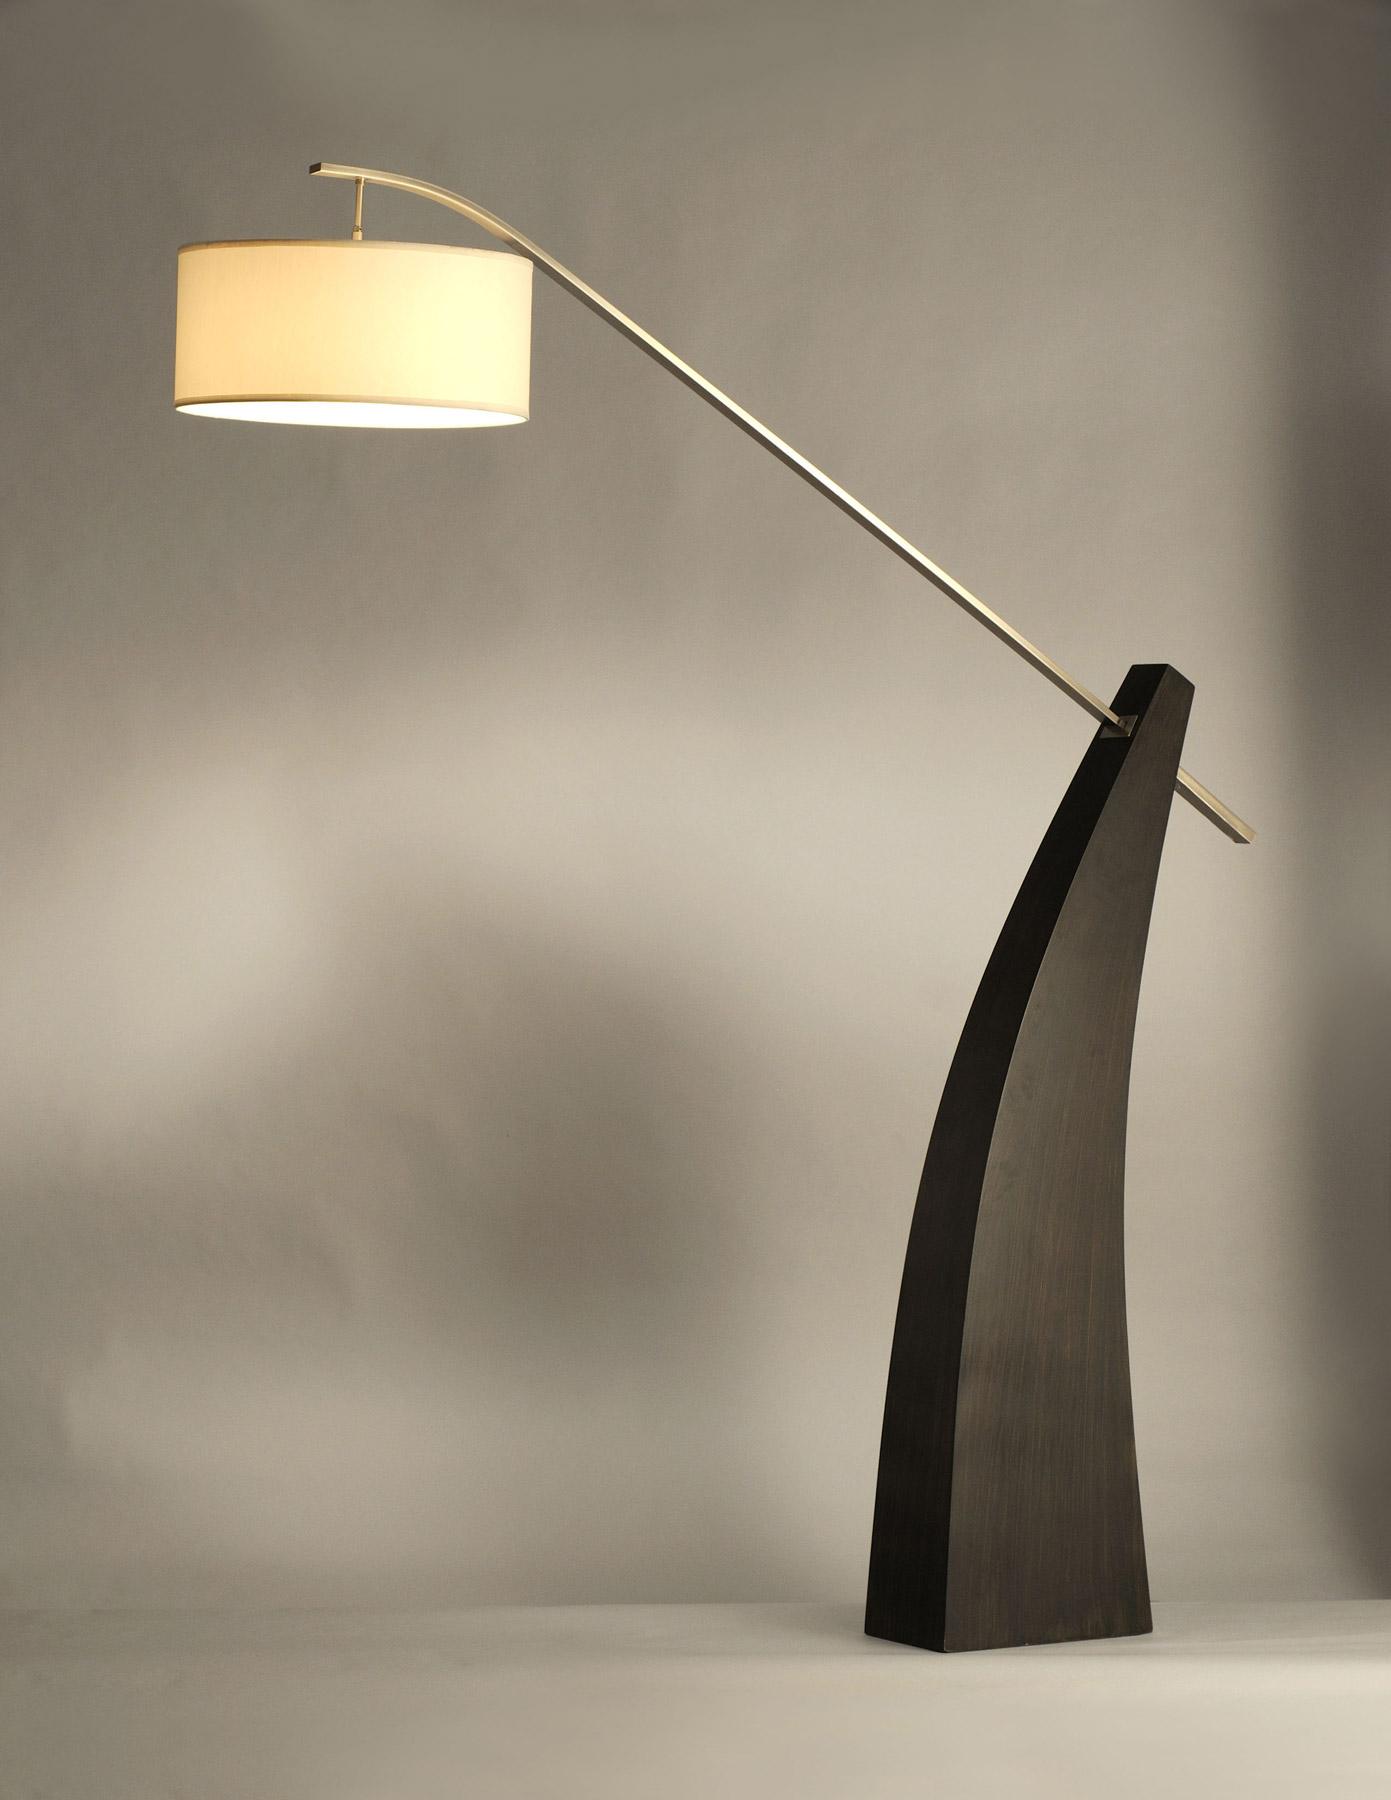 home lamps floor lamps arc floor lamps nova lighting 10519. Black Bedroom Furniture Sets. Home Design Ideas